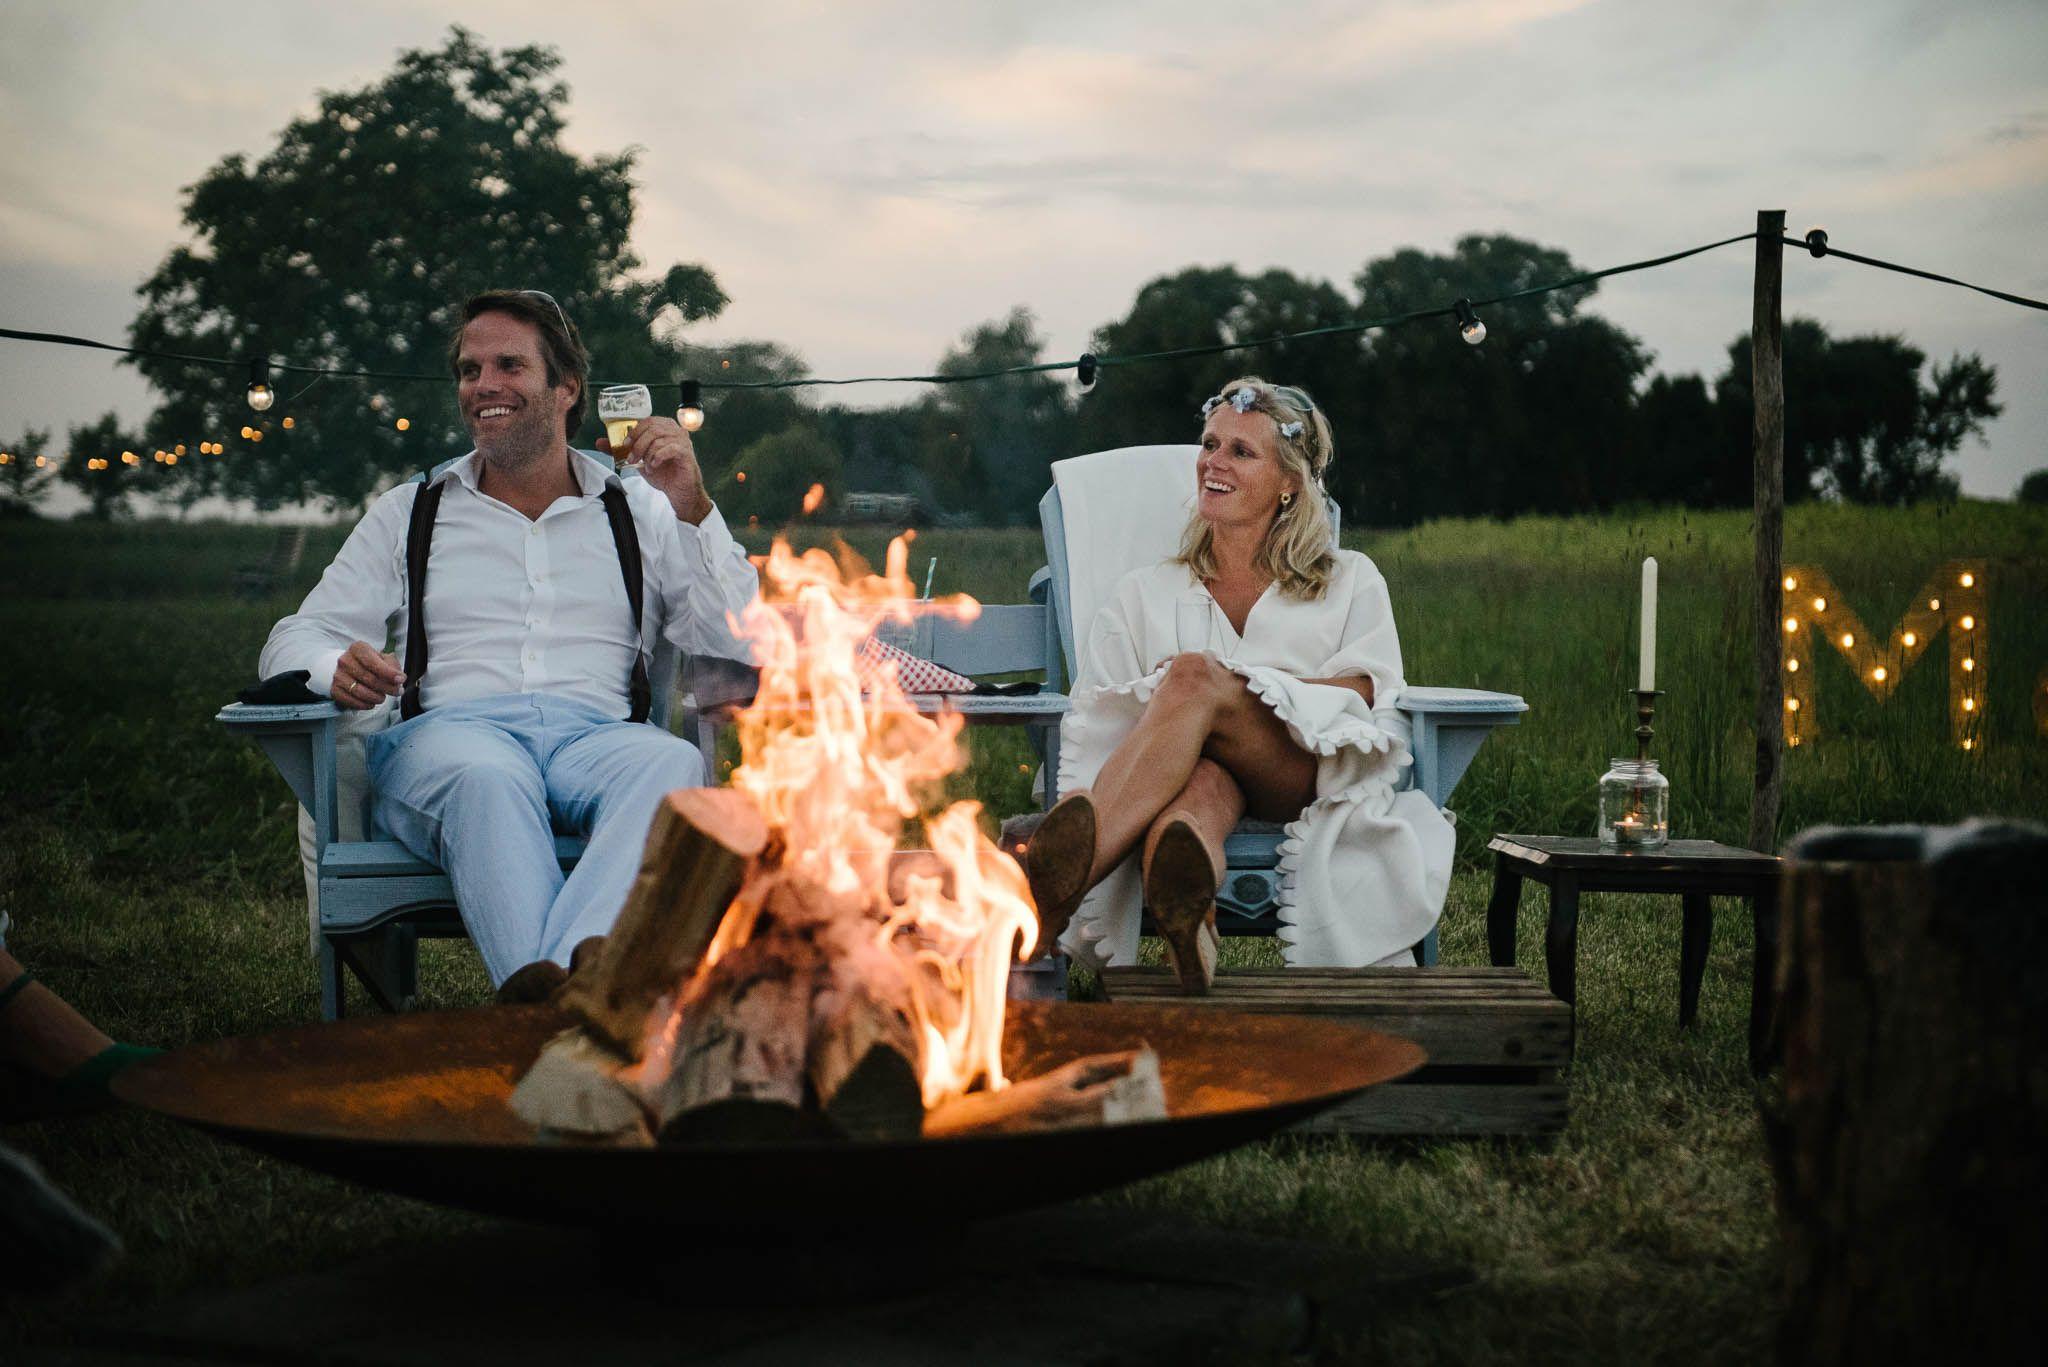 bohemian bruiloft festival stijl vuurkorf